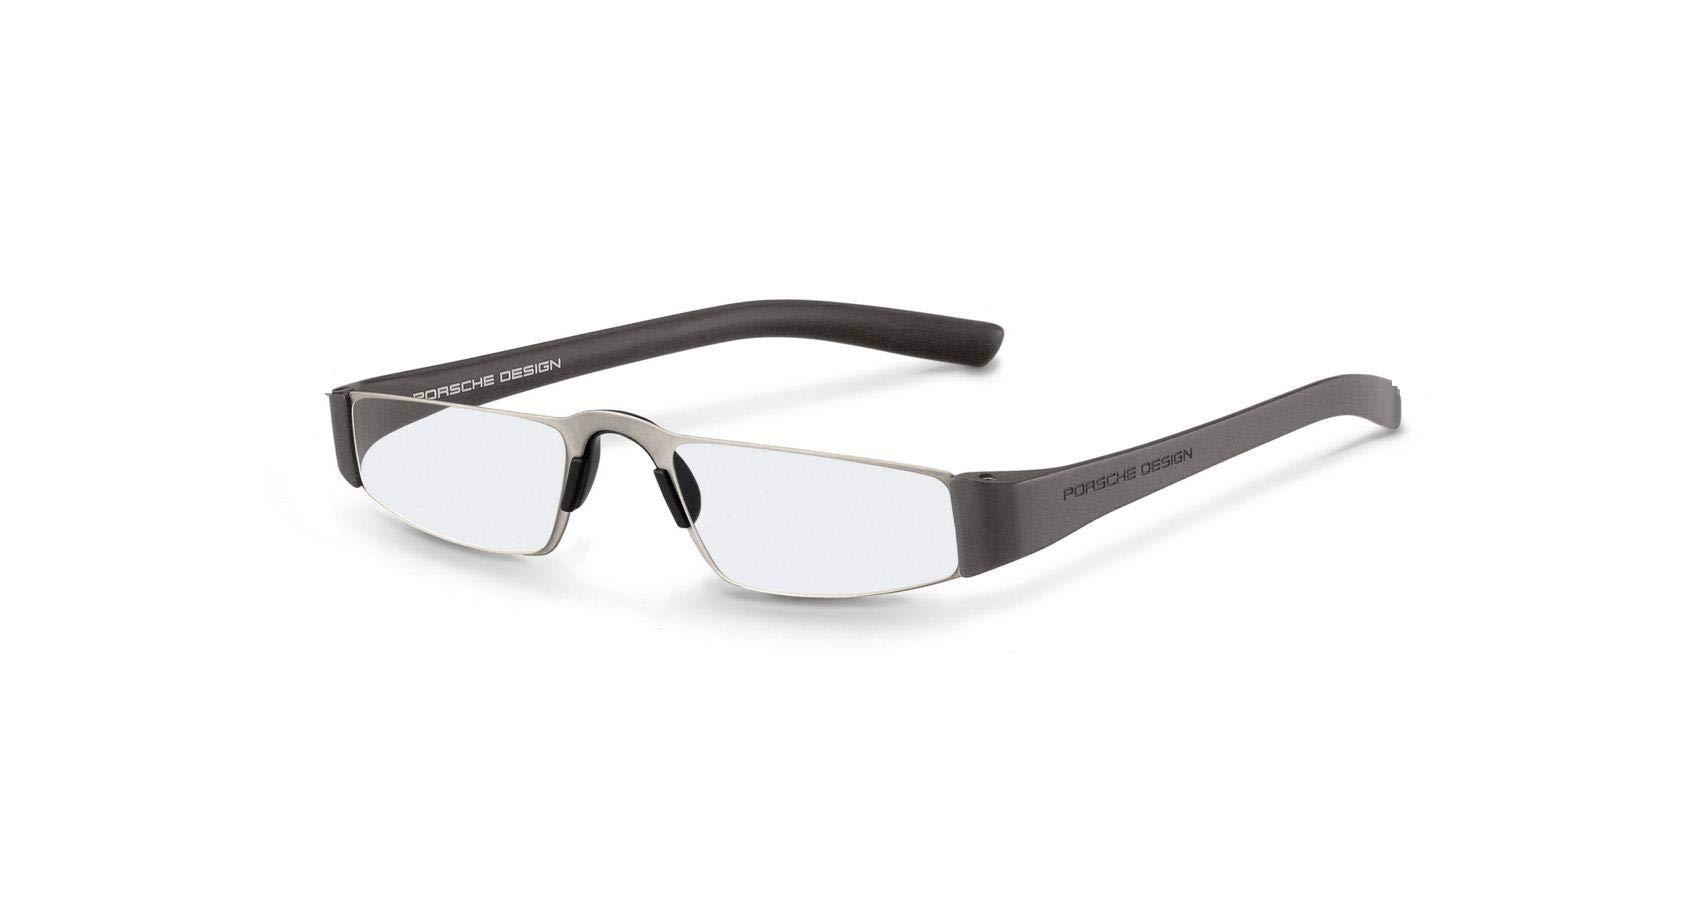 Authentic Porsche Design P 8801 F Titanium Silver +1.50 Reading Glasses